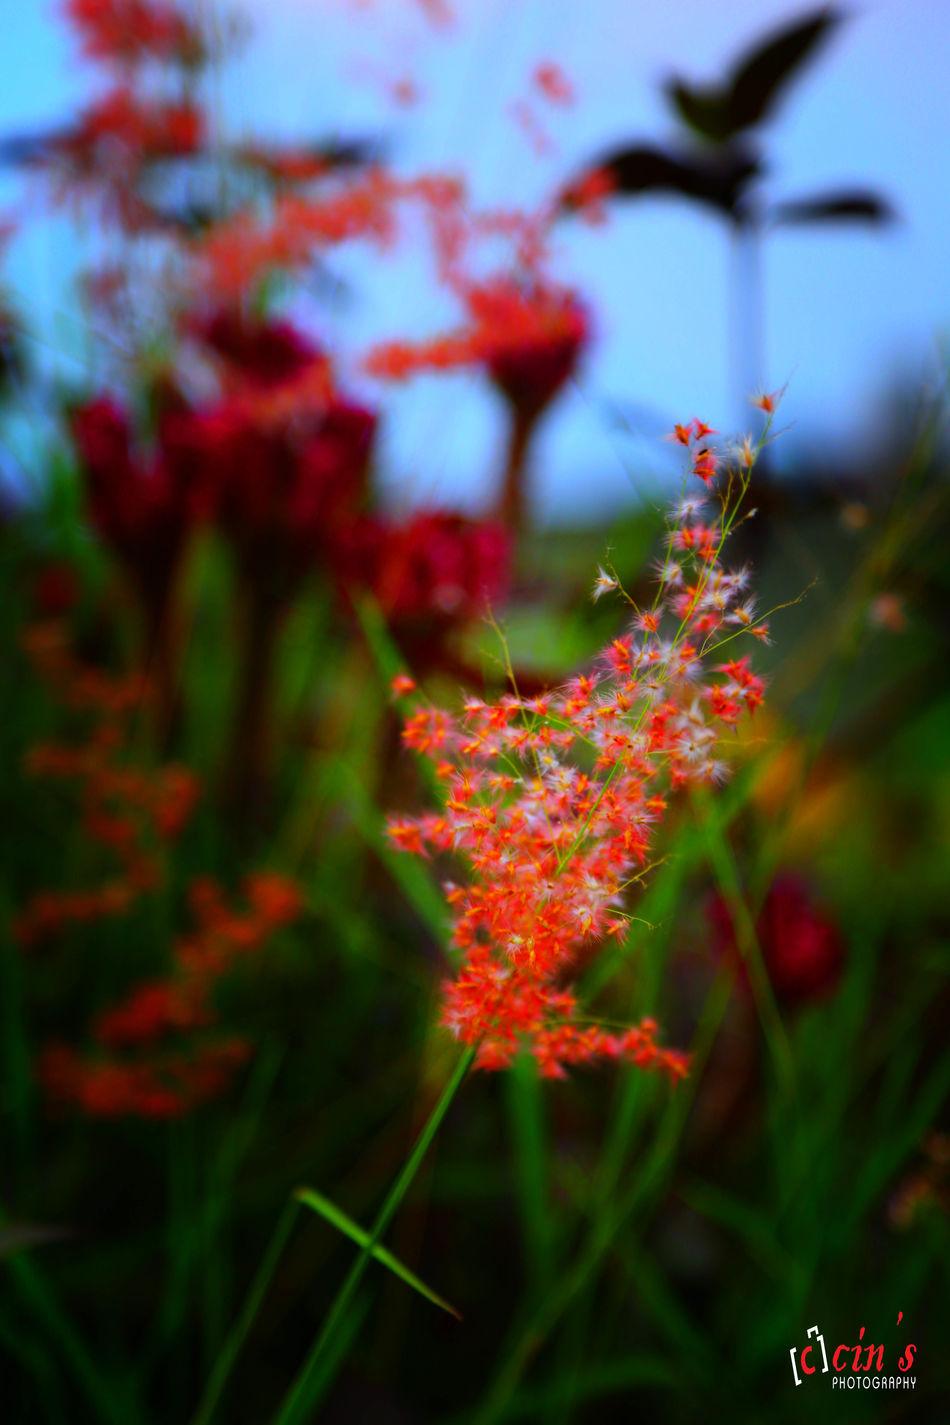 EyeEm Nature Lover EyeEm Best Shots Nature_collection Flowerporn